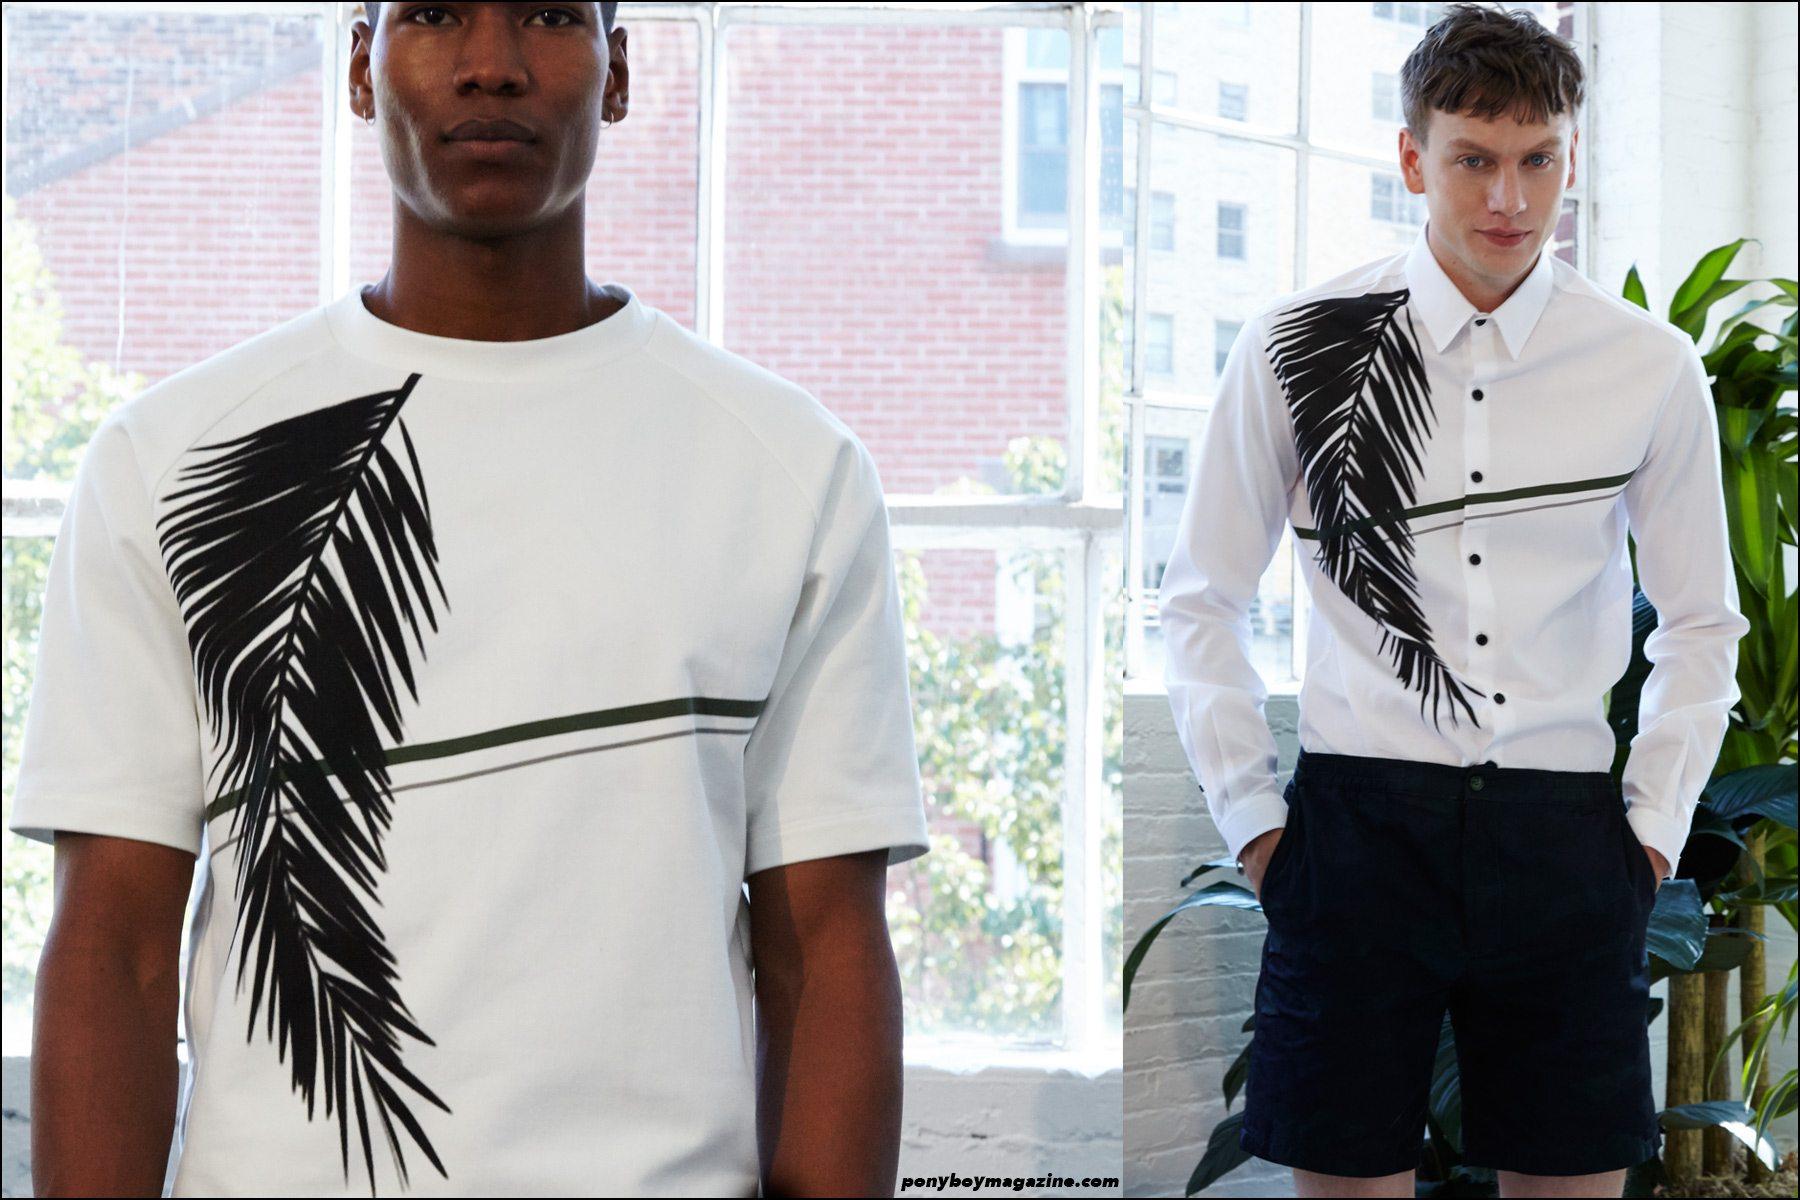 Male model Sid Ellisdon photographed at menswear designer Carlos Campos presentation, Spring/Summer 2016 at Industria Studios NY. Photography by Alexander Thompson for Ponyboy magazine NY.